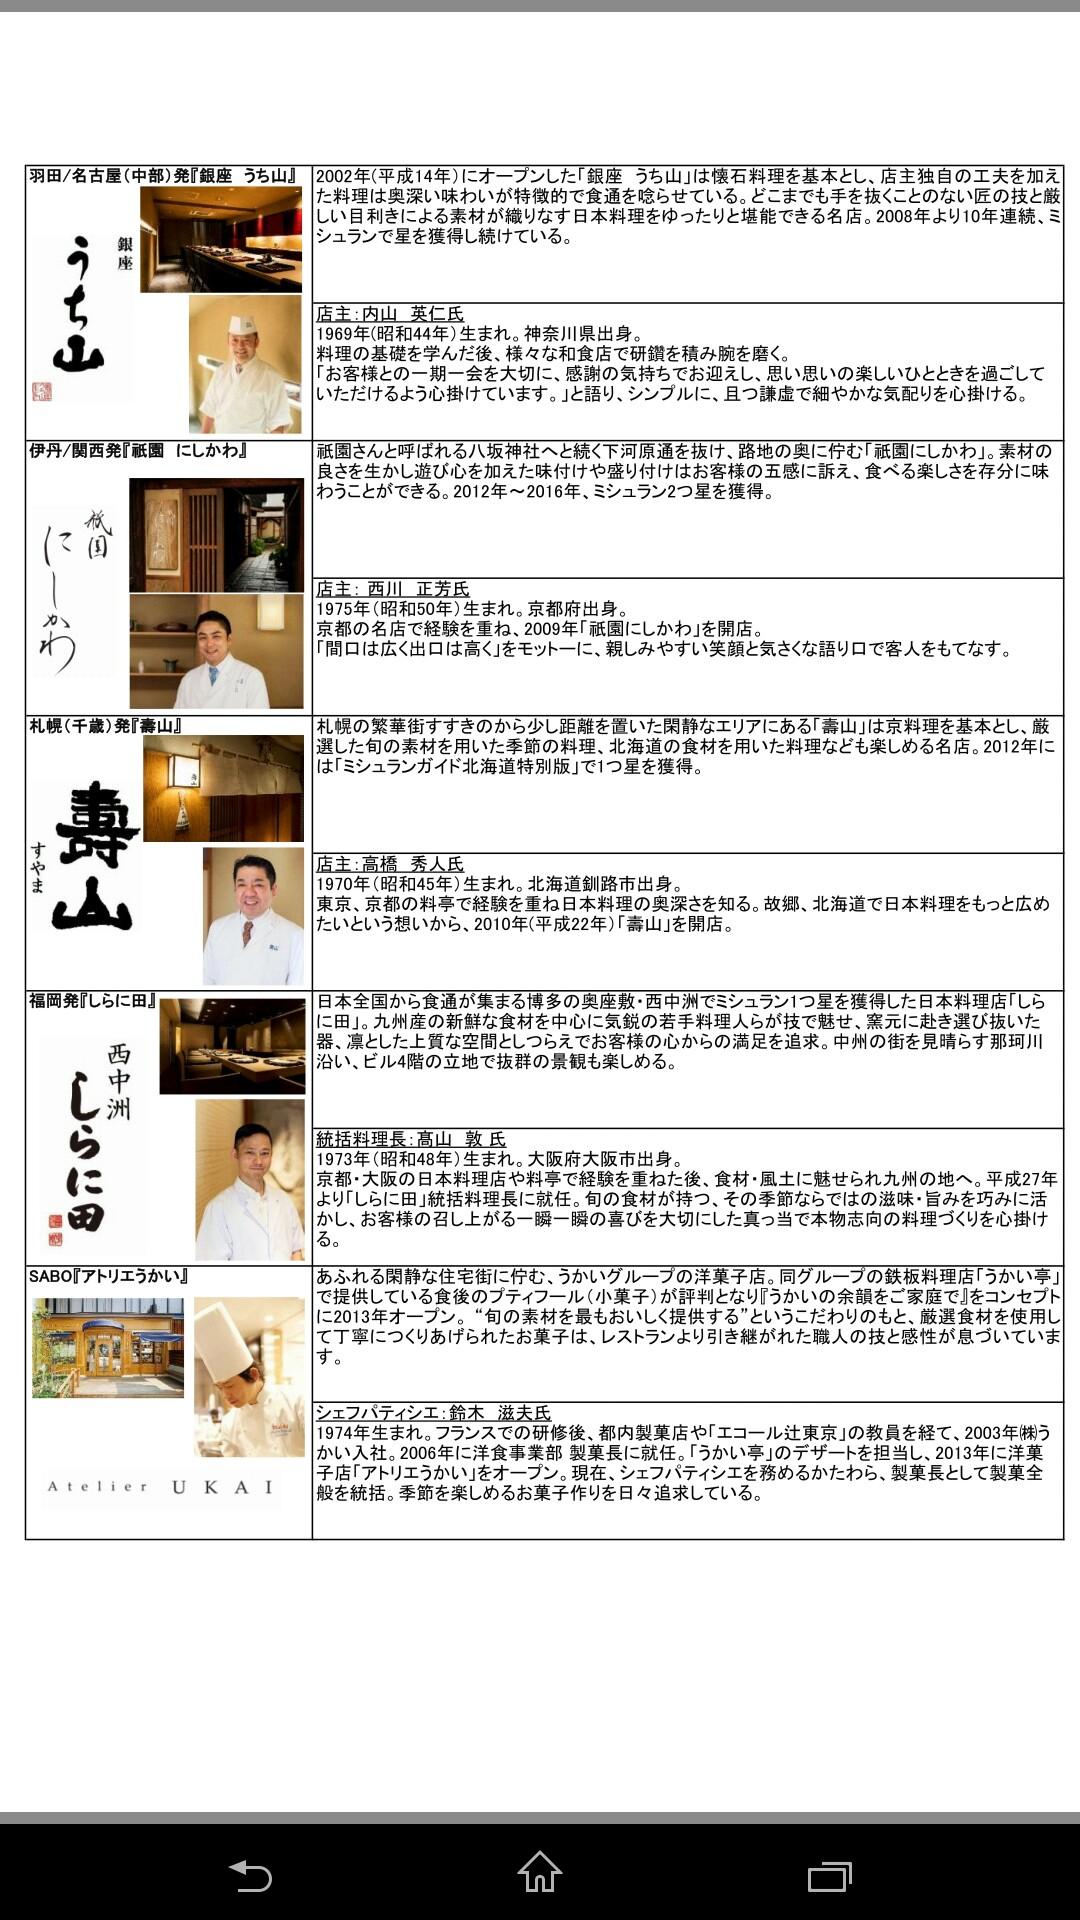 f:id:yoshiki808:20170227224536j:plain